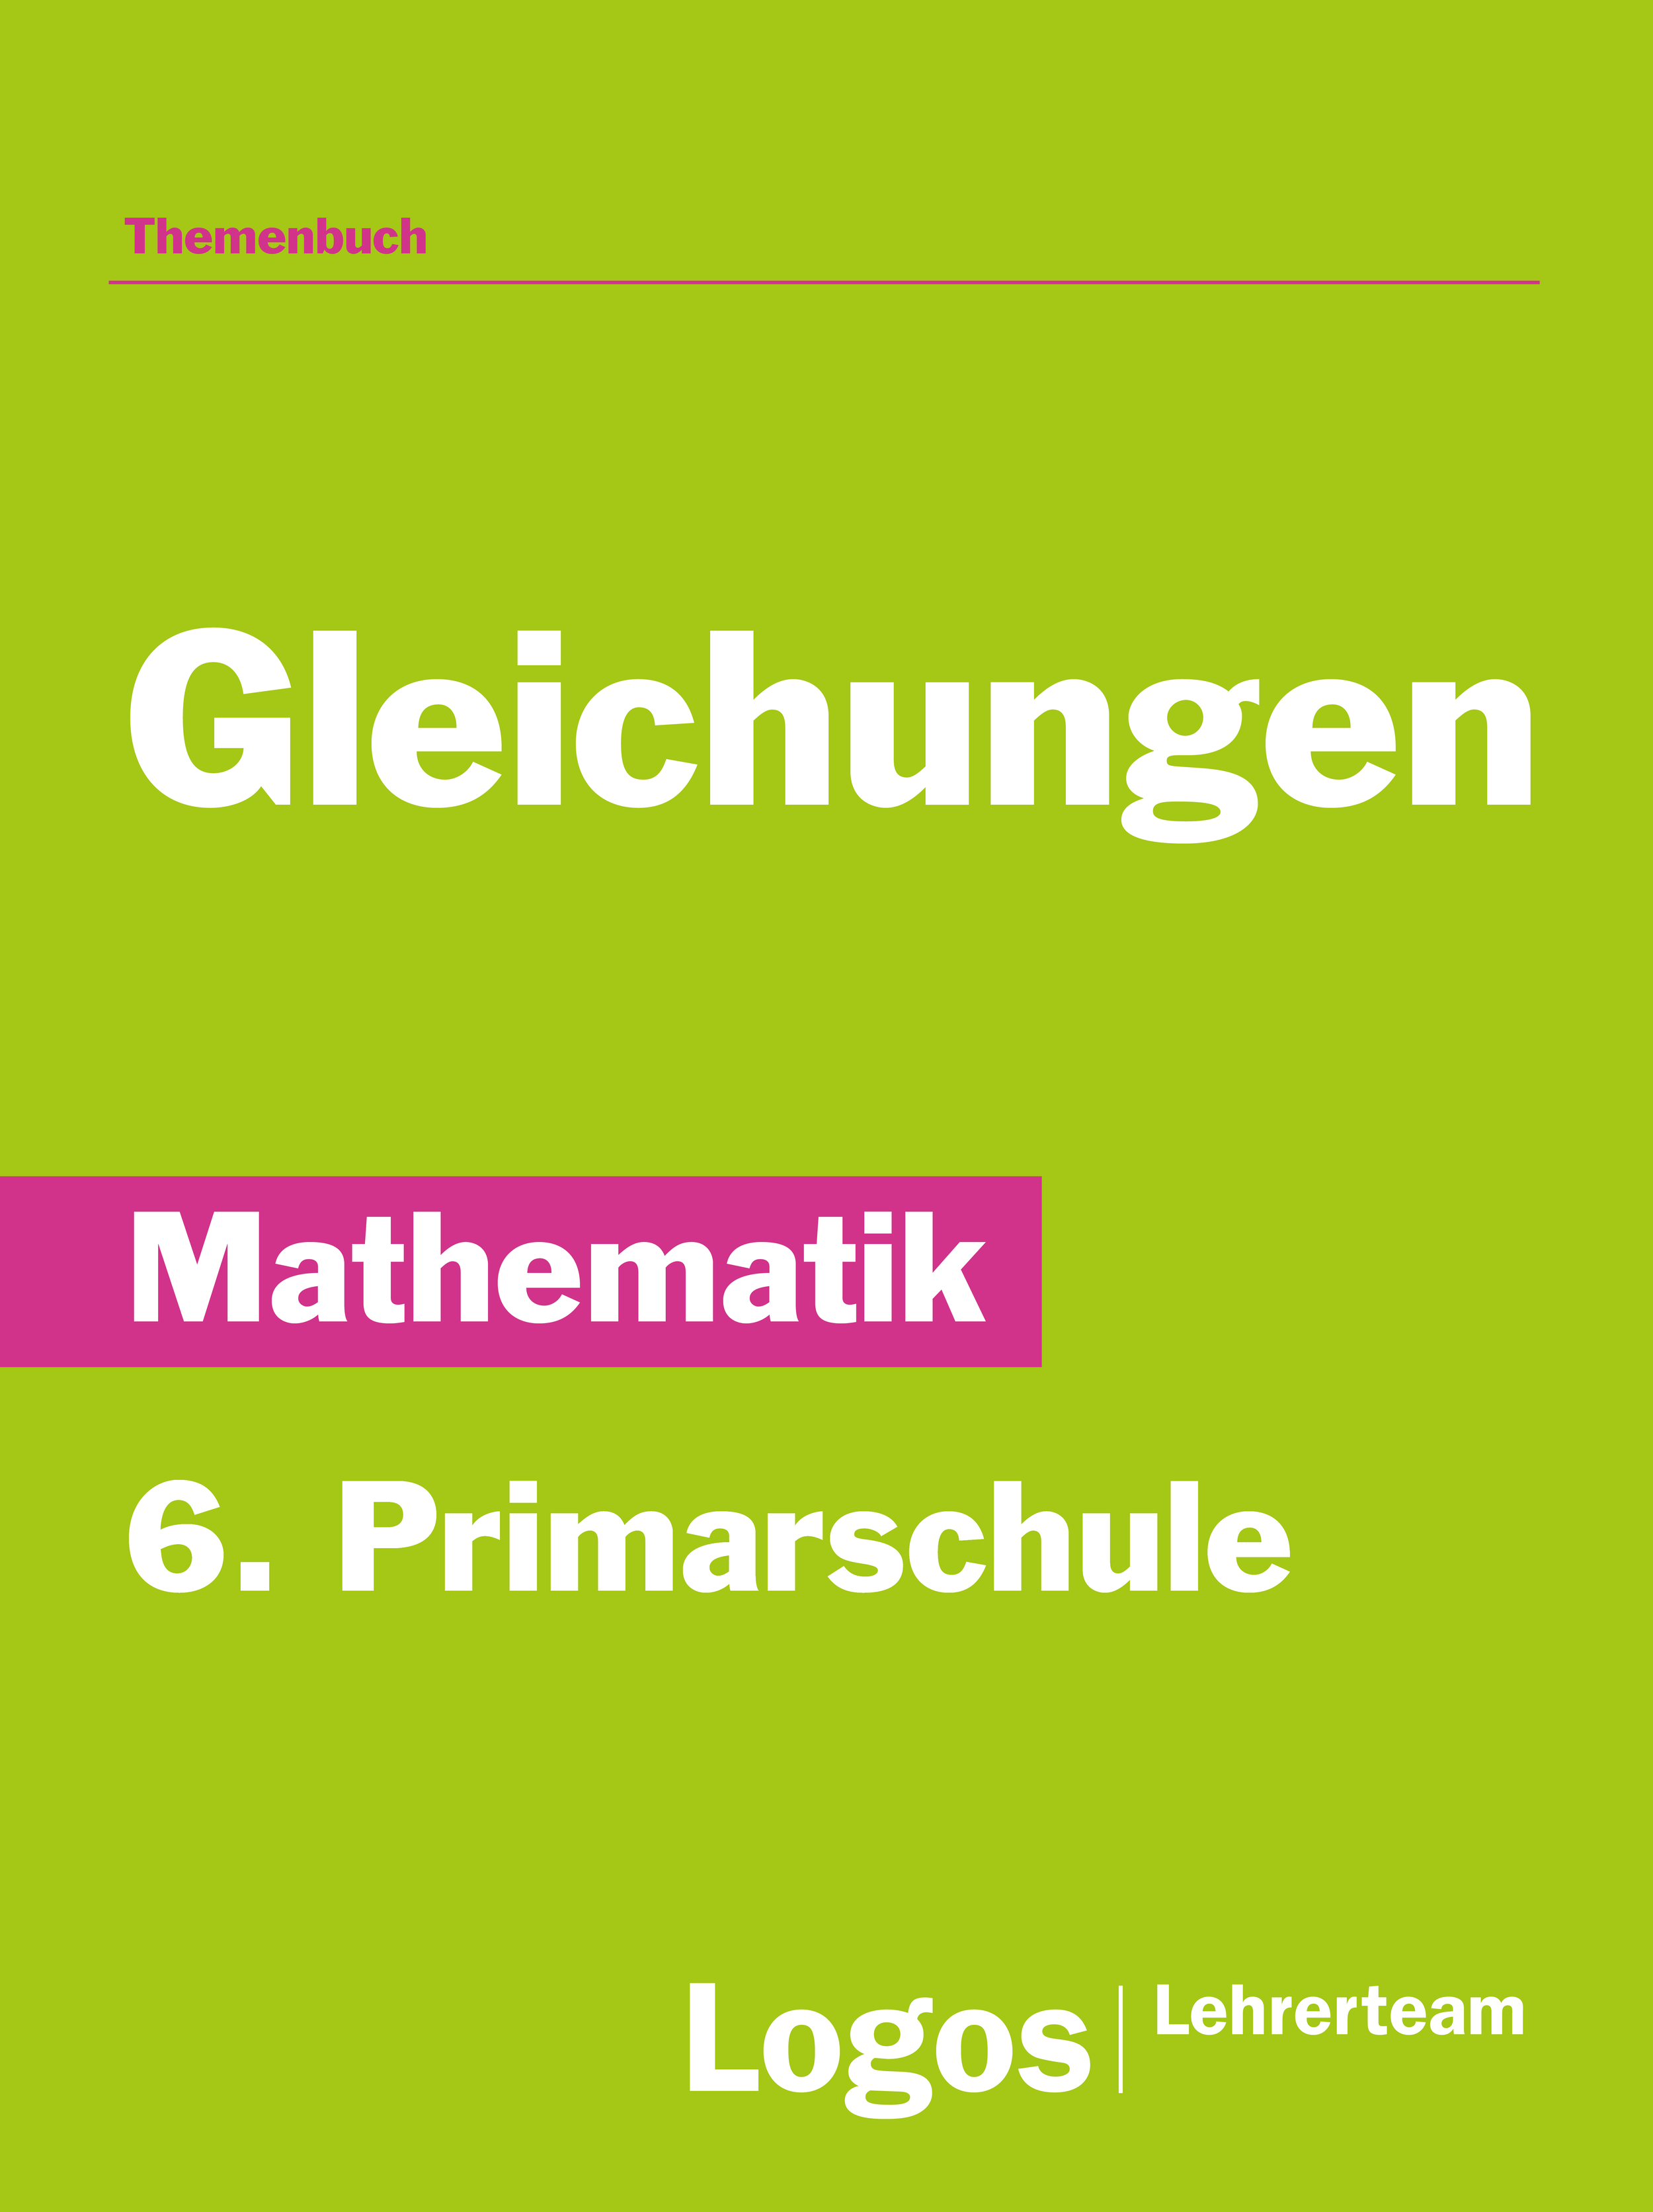 PM 6 Gleichungen.png